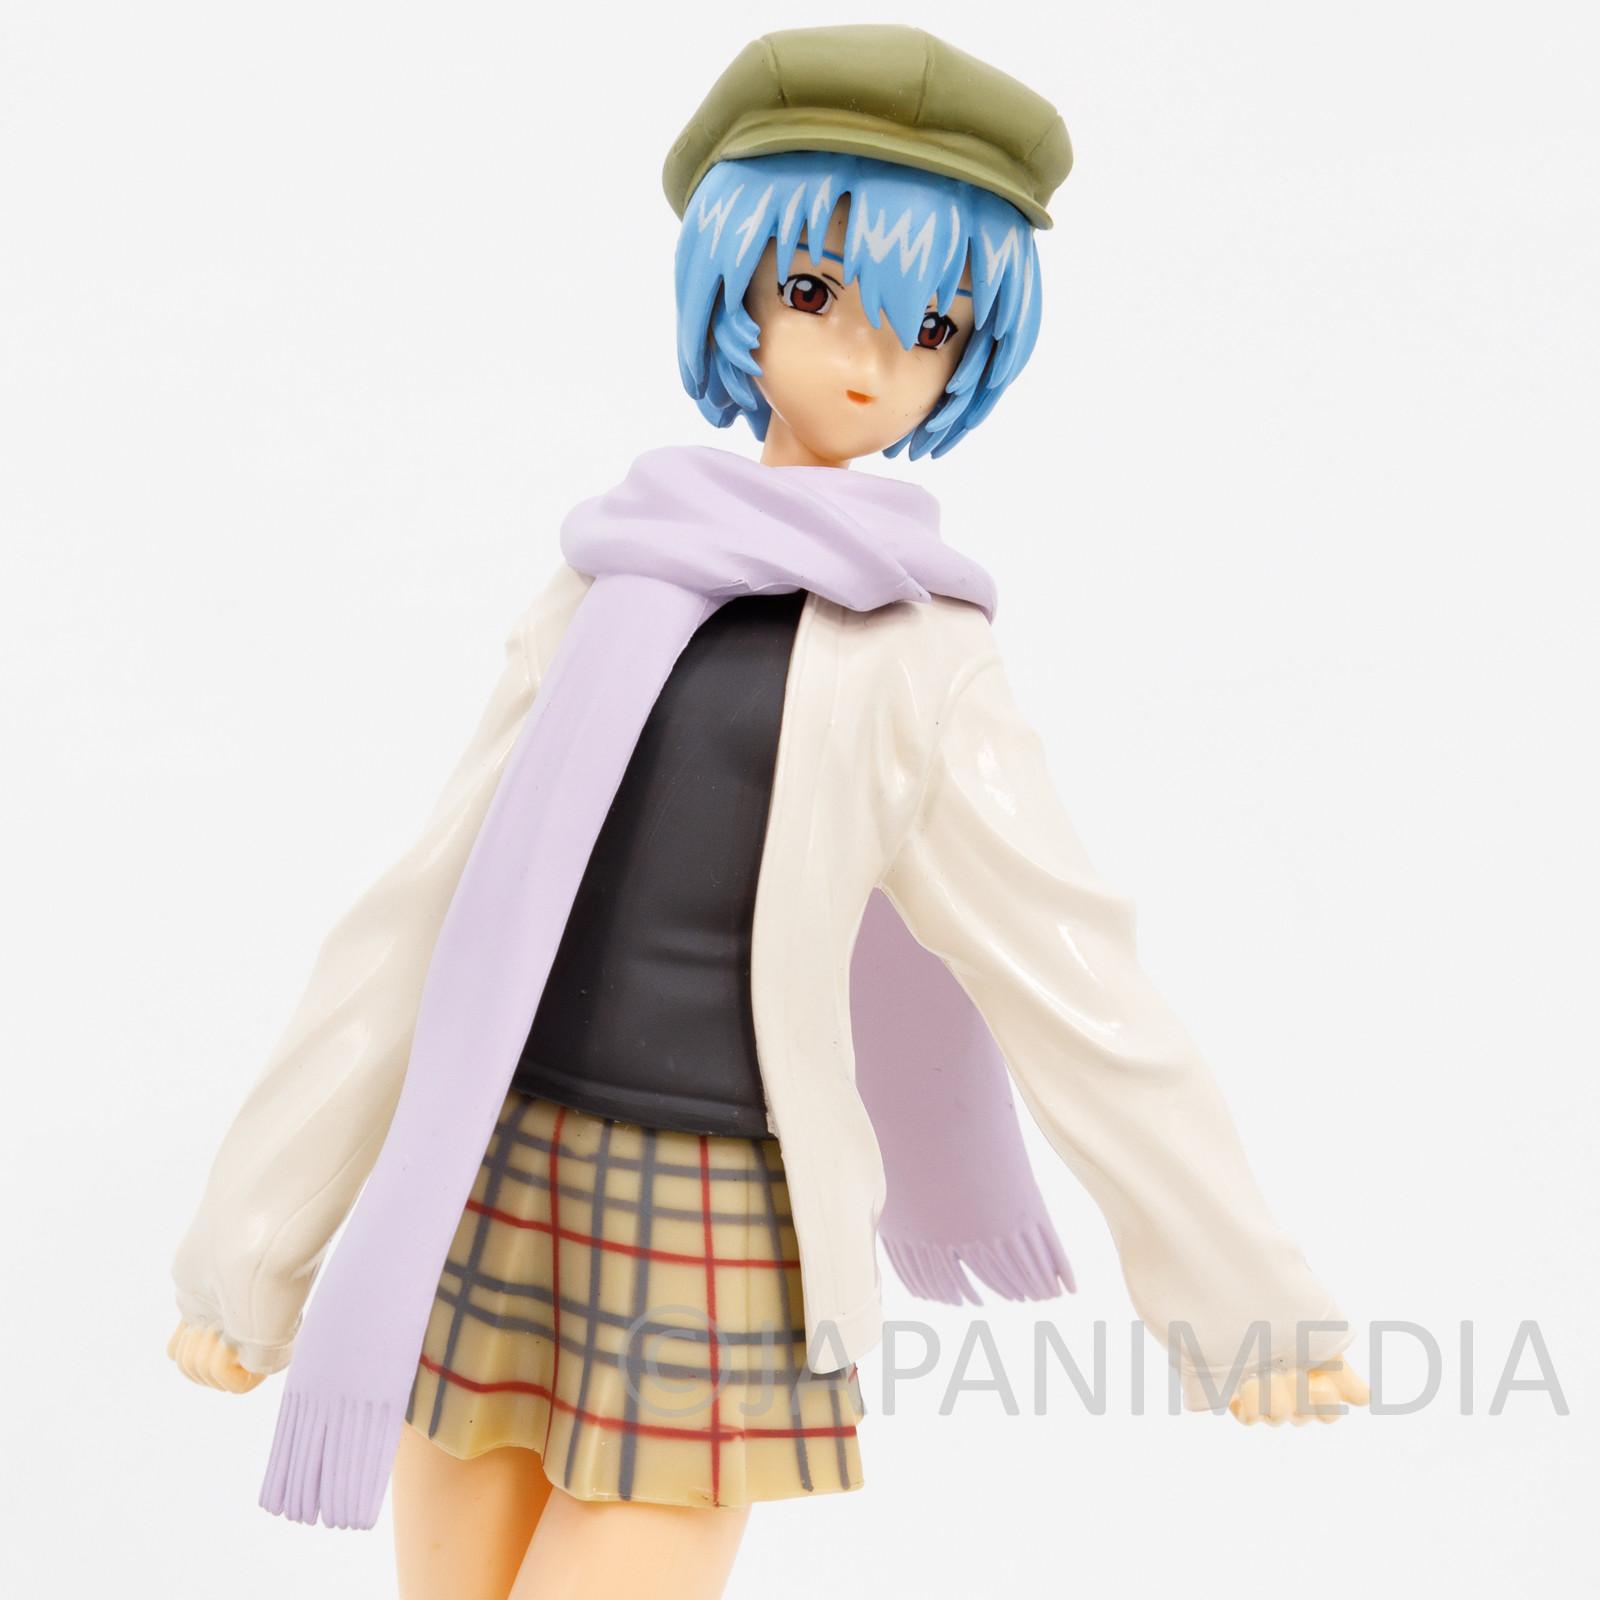 Evangelion Rei Ayanami Casual Clothes Figure SEGA JAPAN ANIME MANGA